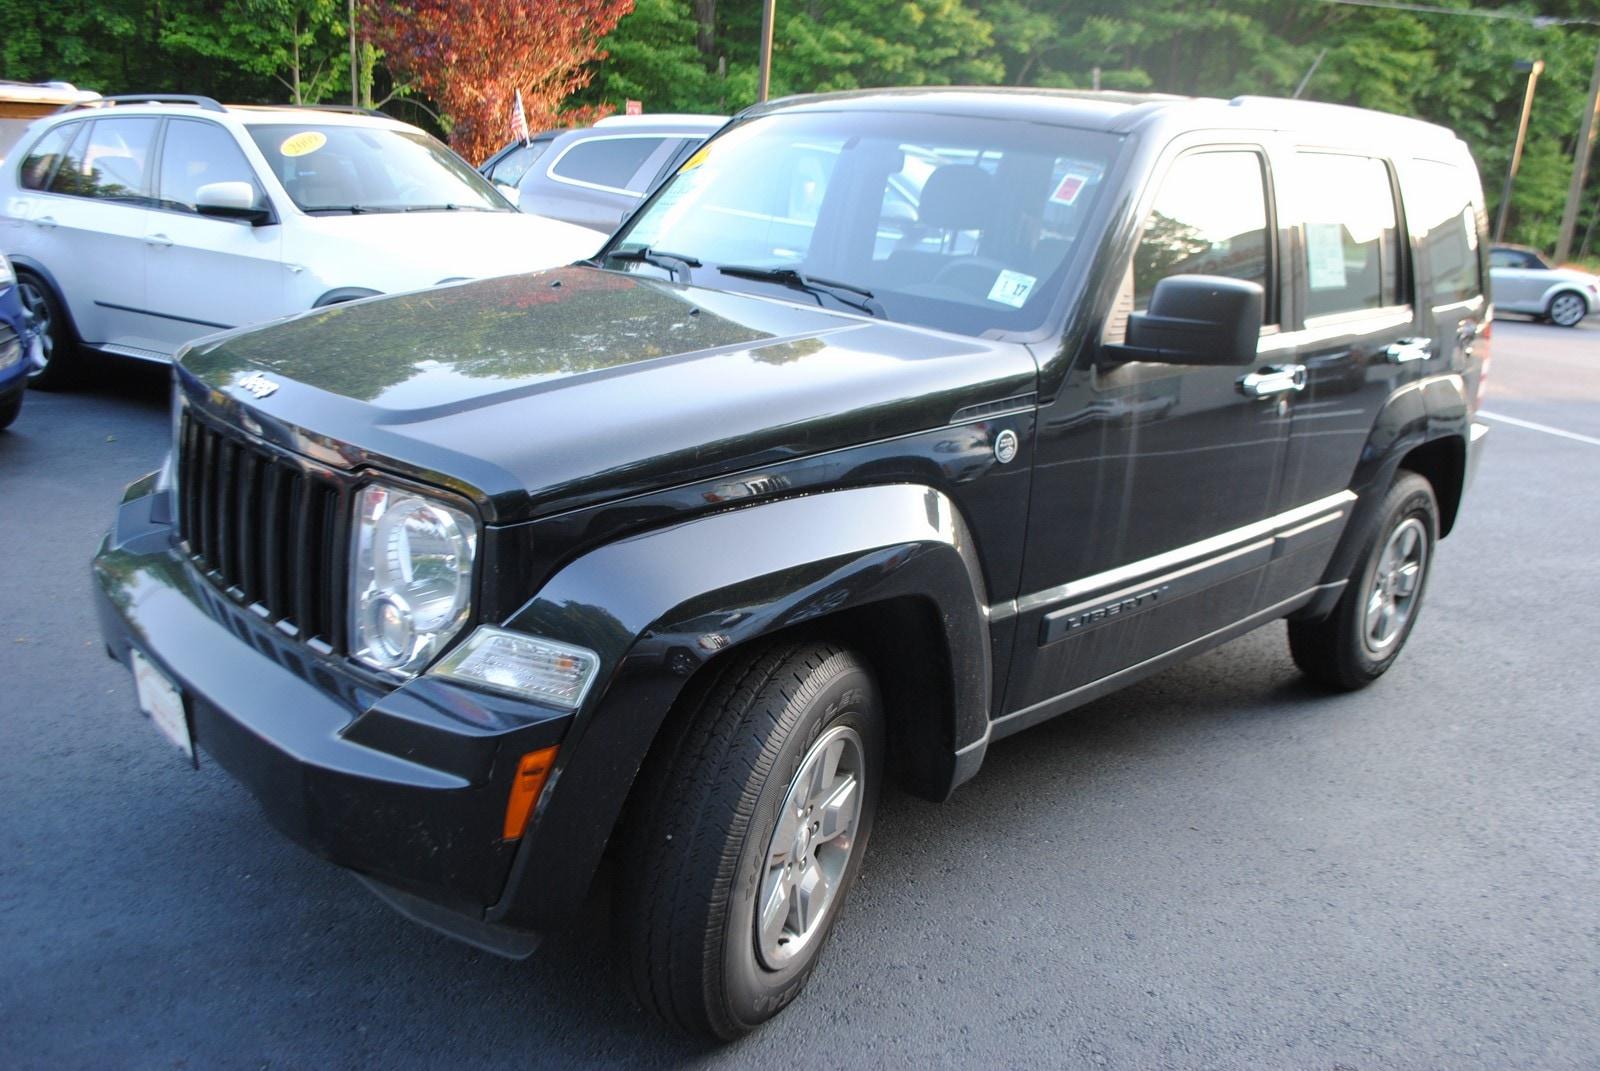 used 2012 jeep liberty for sale west milford nj. Black Bedroom Furniture Sets. Home Design Ideas